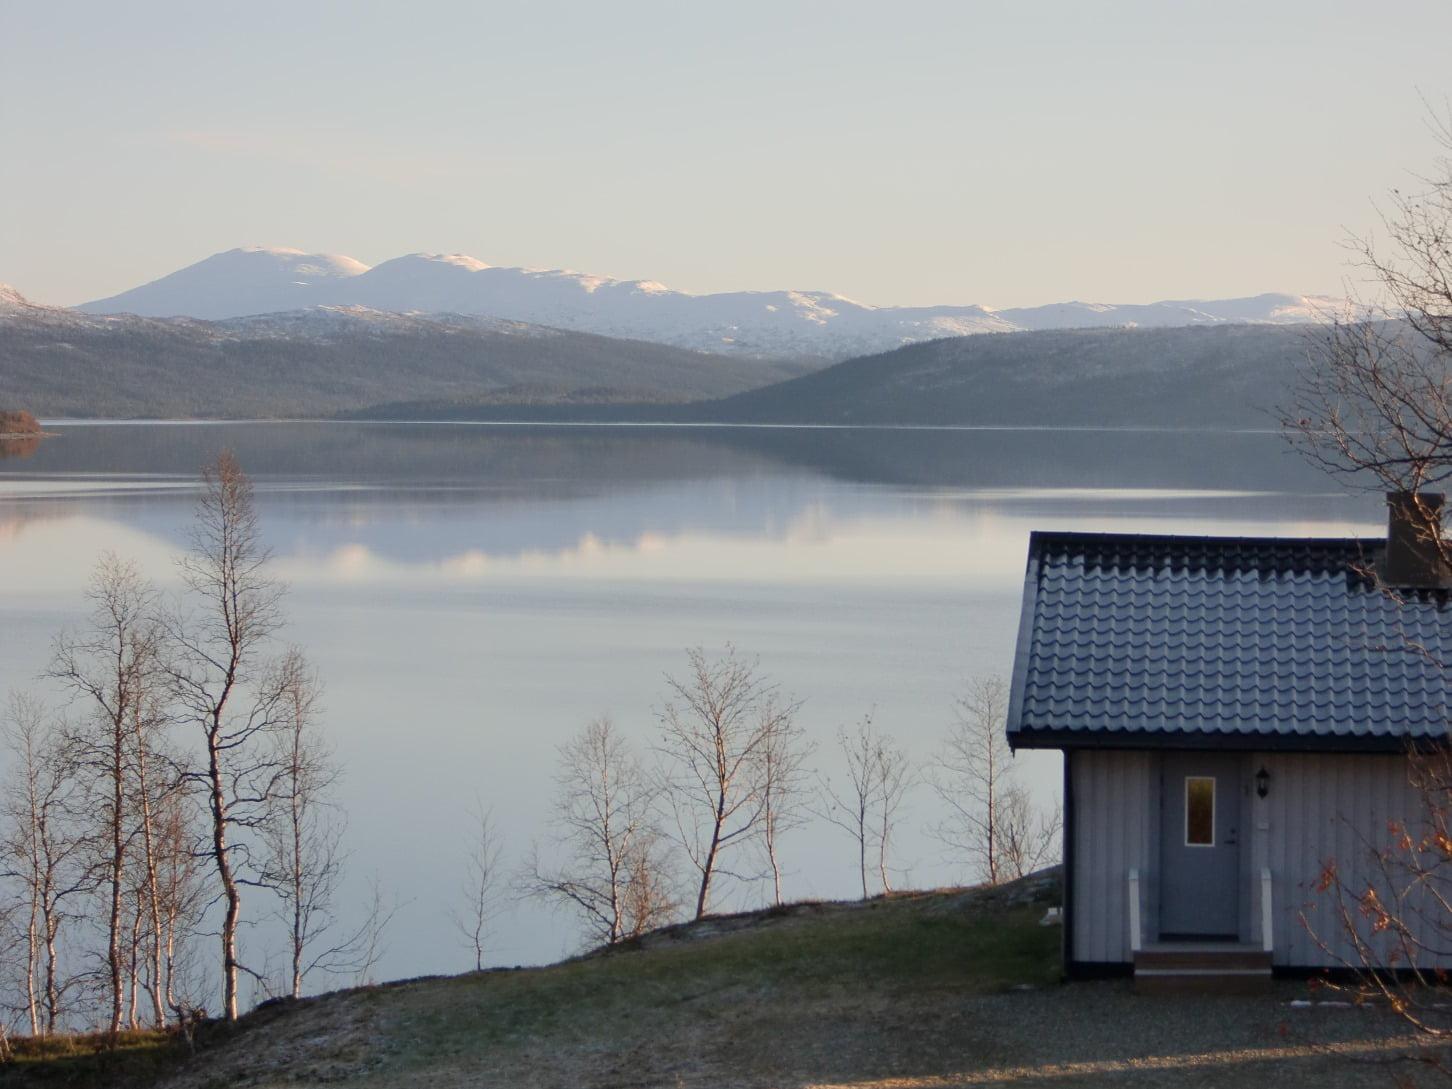 Hyra stuga vid Stora Blåsjön